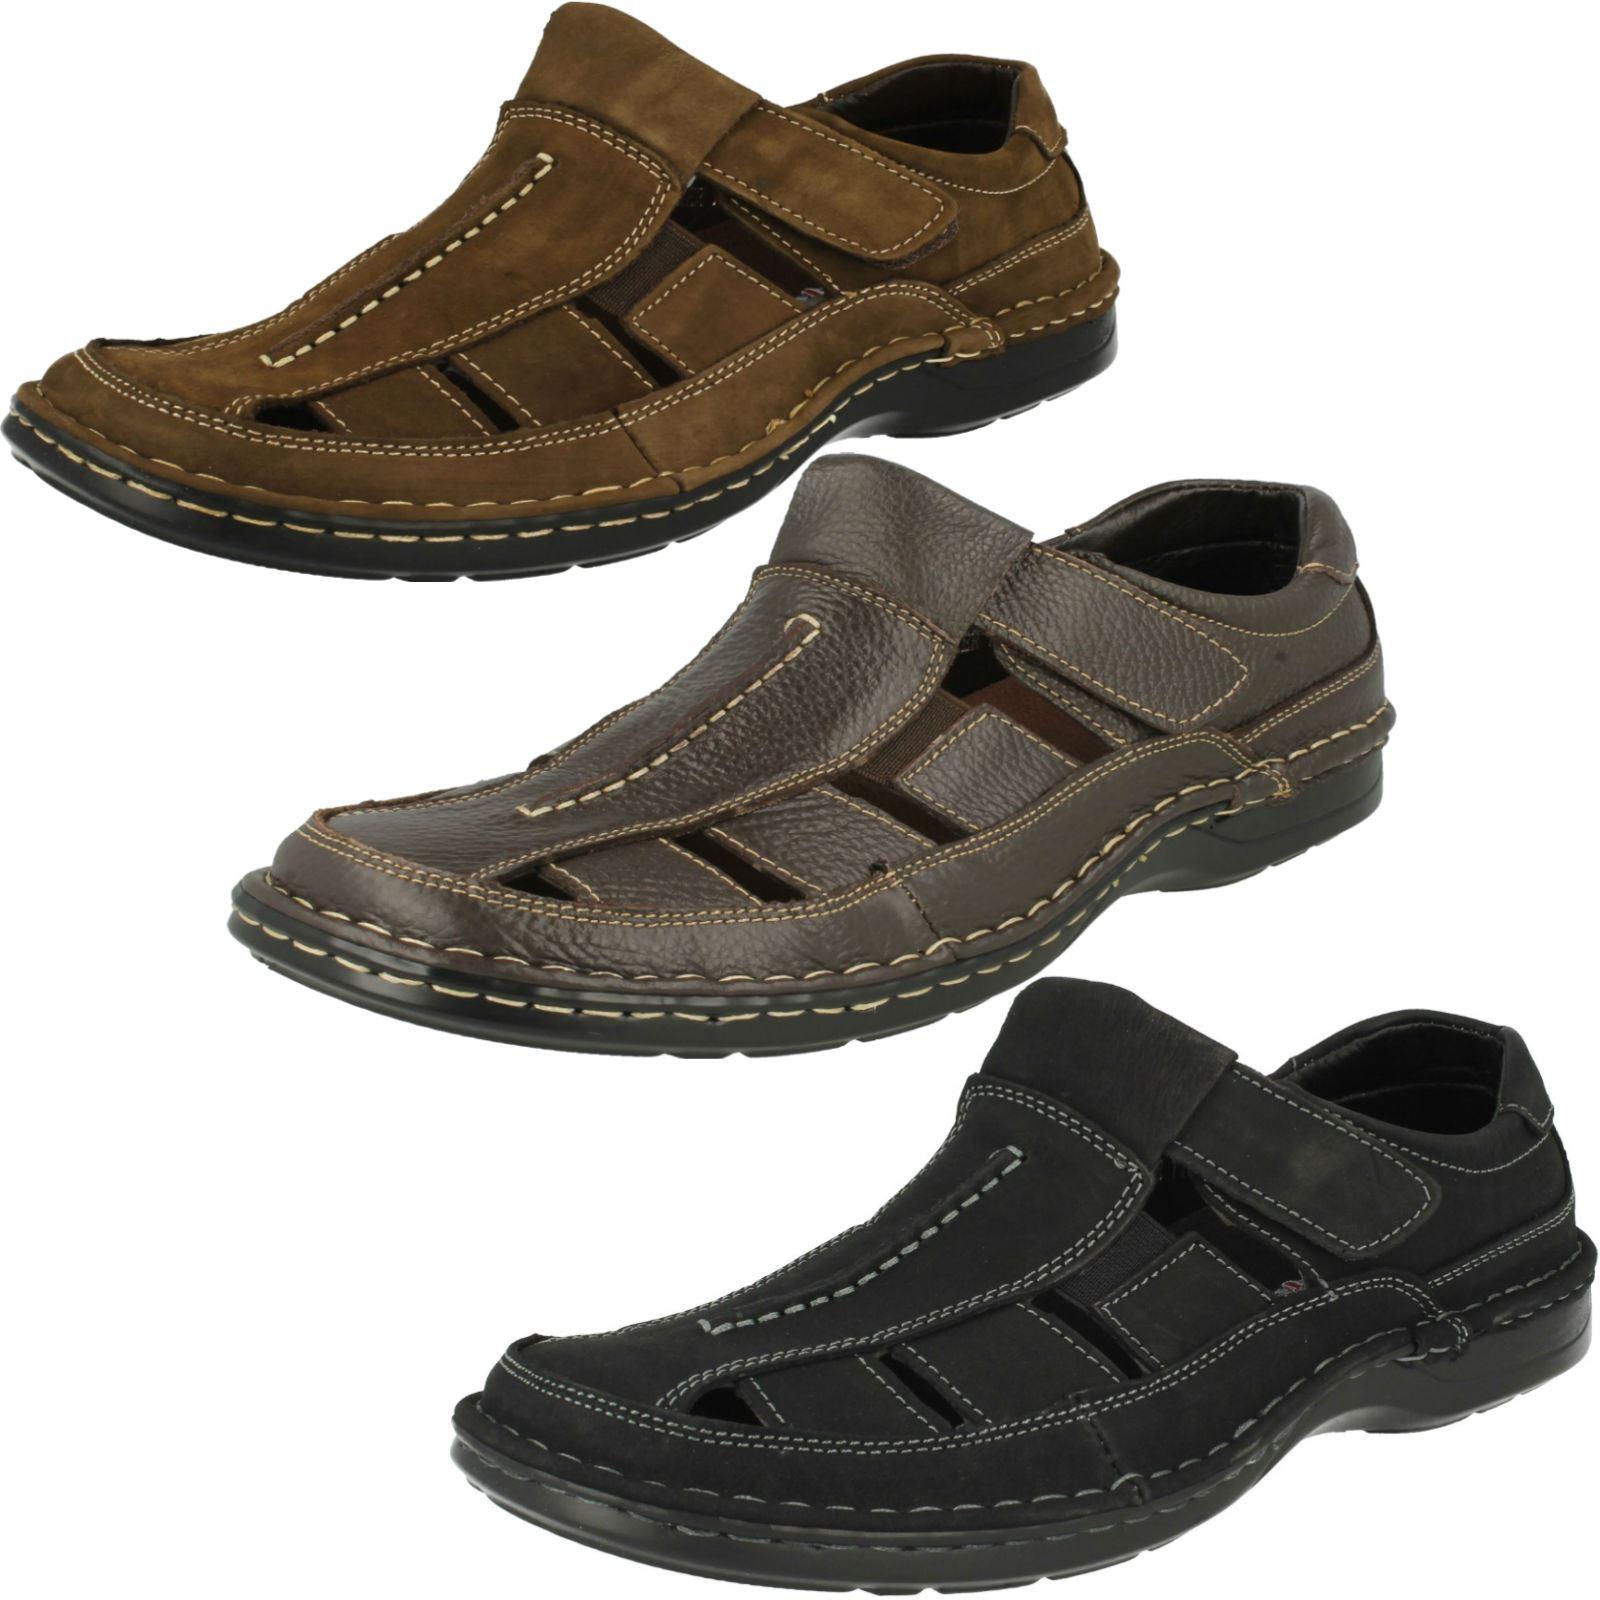 'Mens Padders' Closed Toe Leather Sandals Breaker